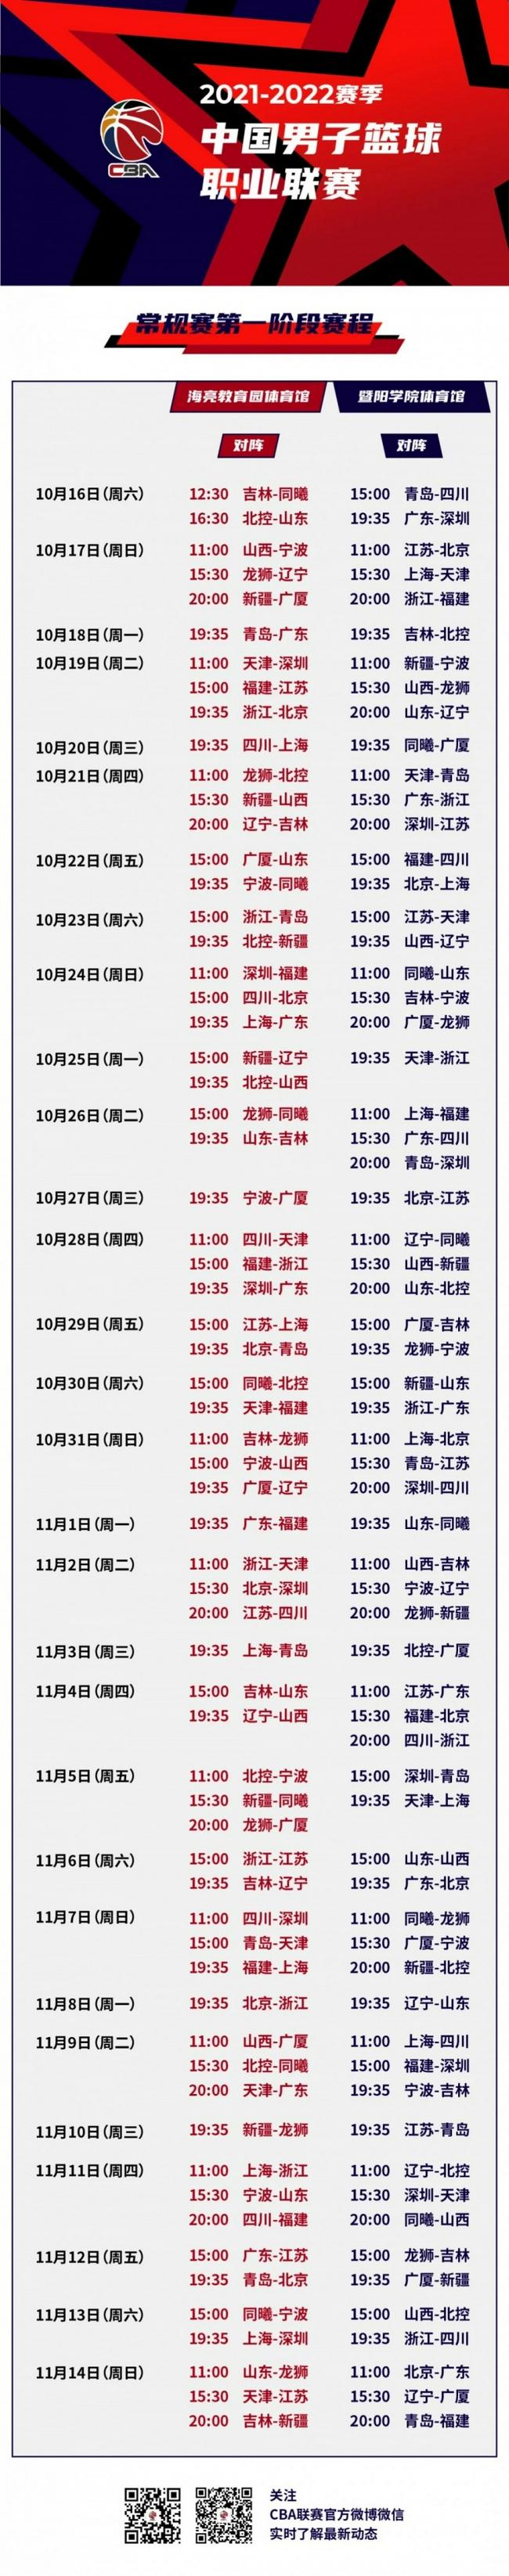 CBA公布常规赛第一阶段赛程 揭幕日广东出战